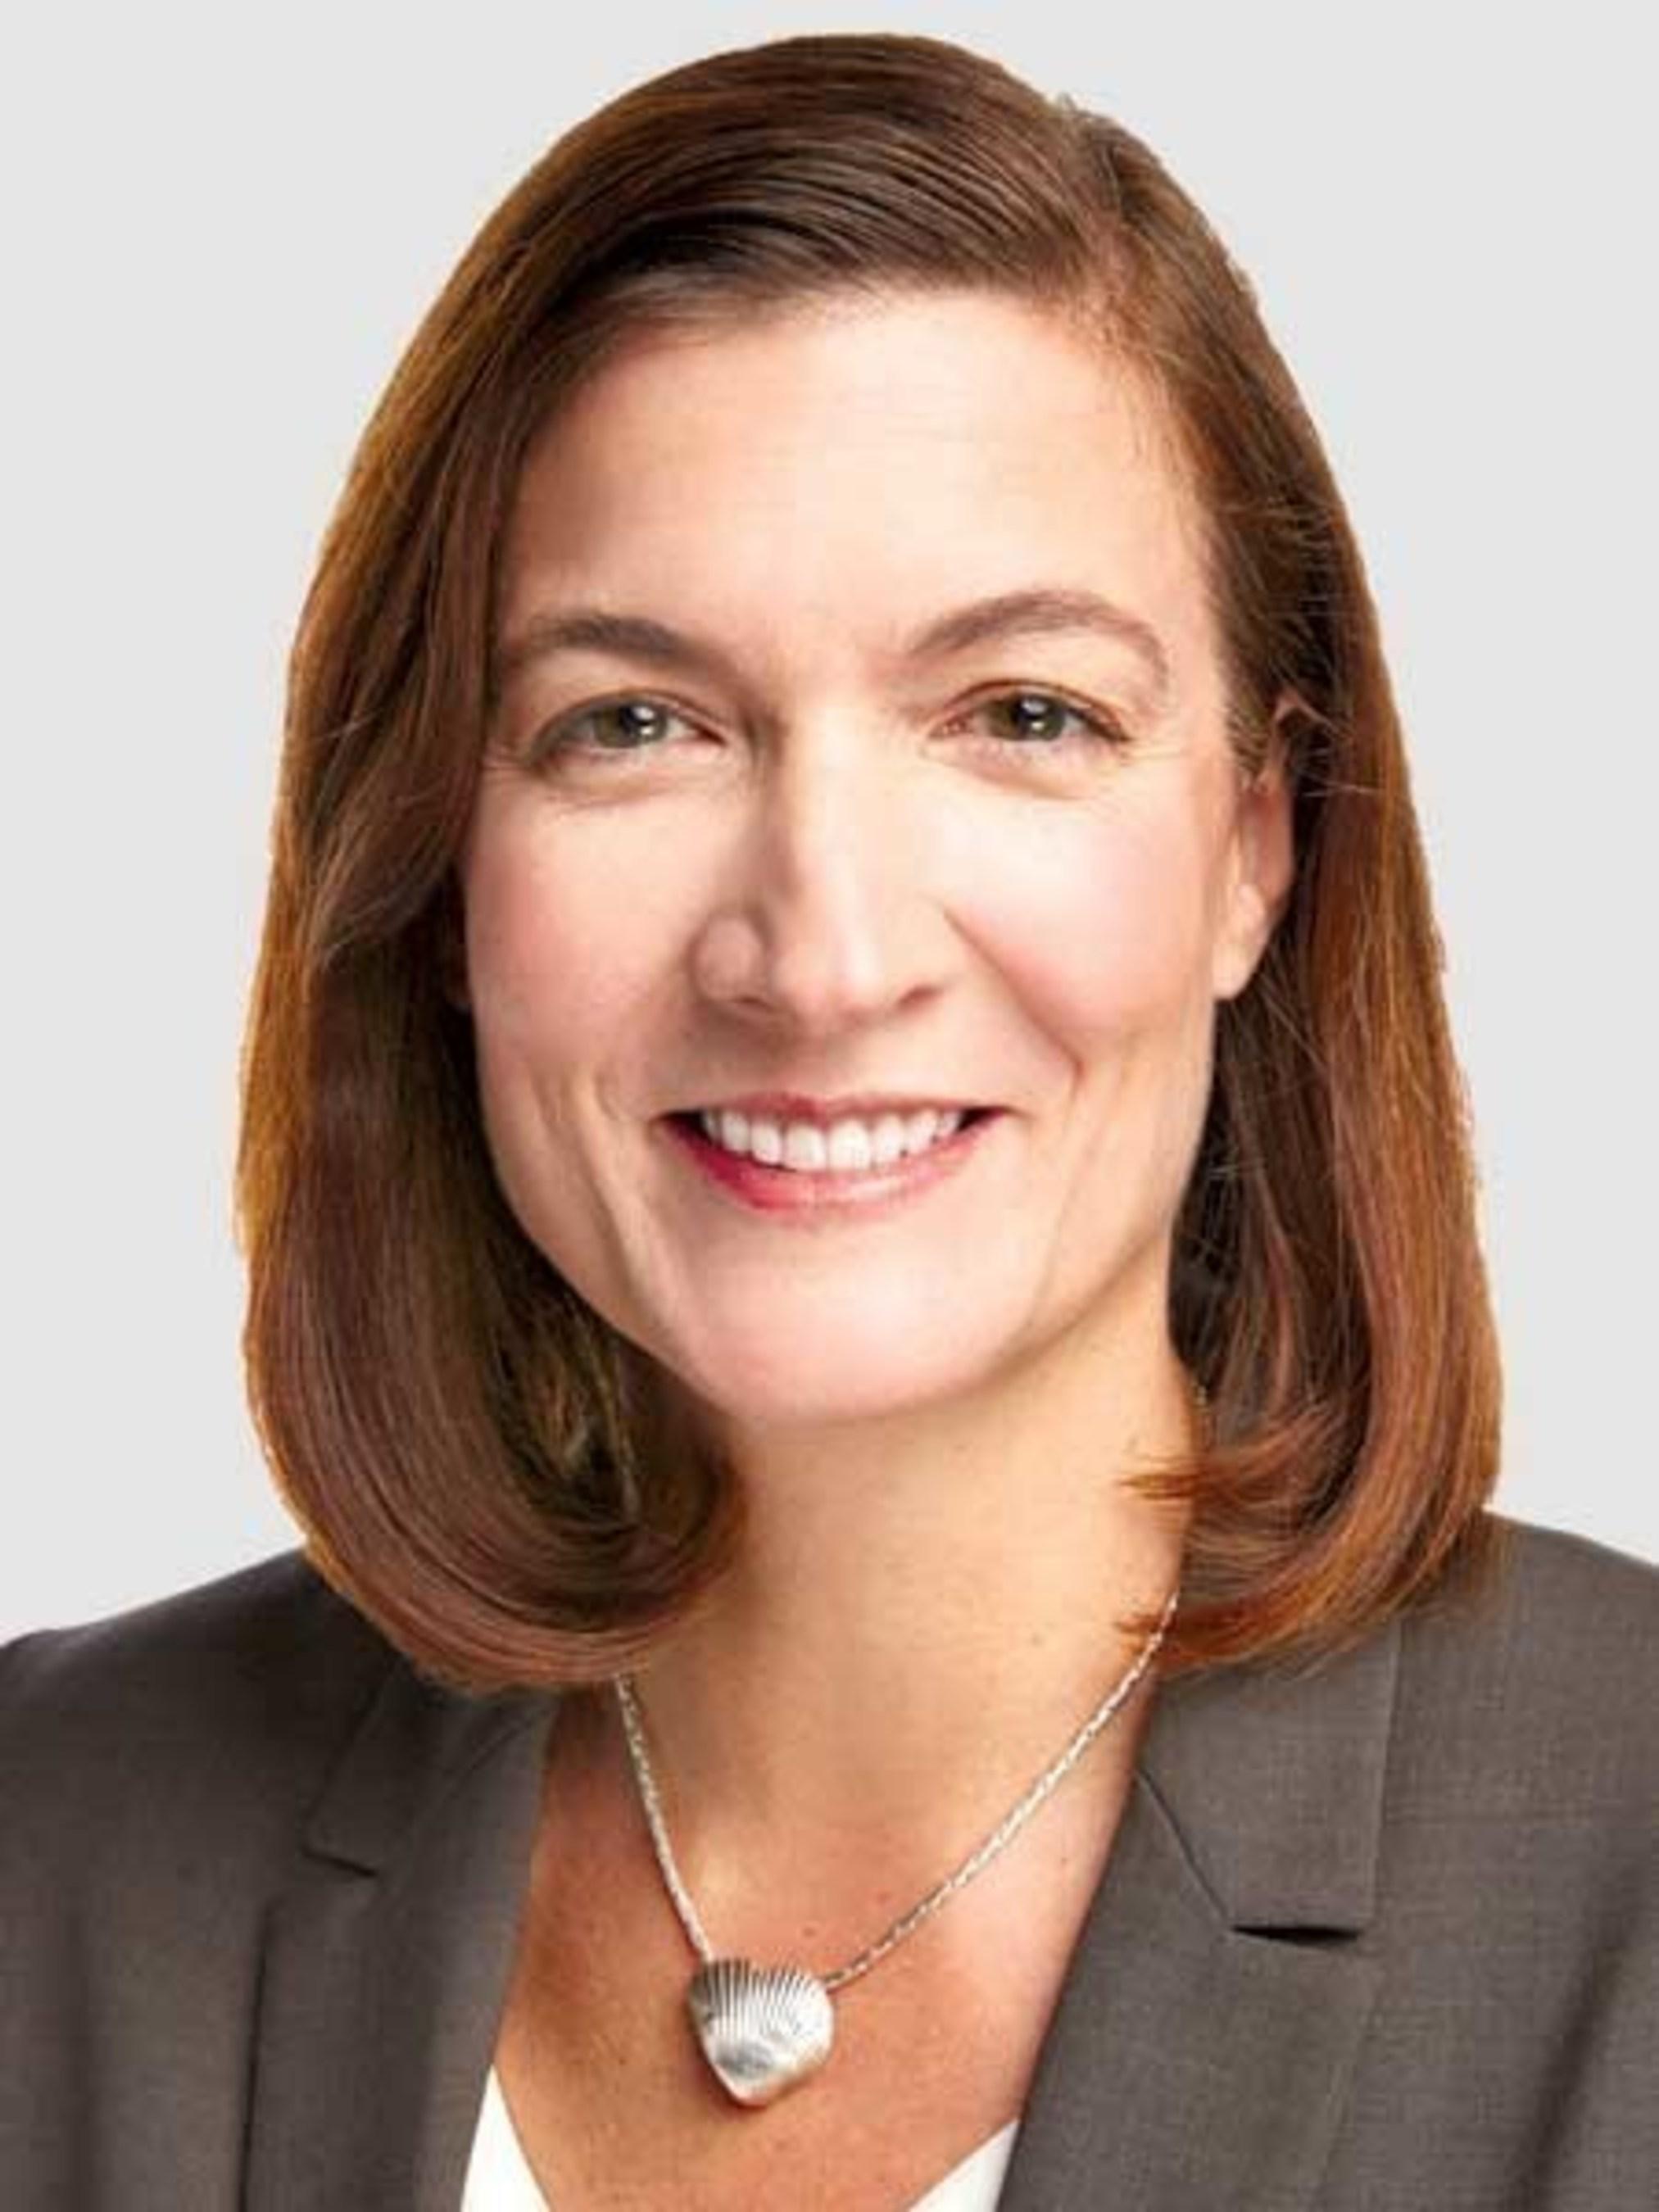 Michelle Borre, sole Portfolio Manager of Oppenheimer Fundamental Alternatives Fund (QVOPX) and lead Portfolio Manager of Oppenheimer Capital Income Fund (OPPEX)